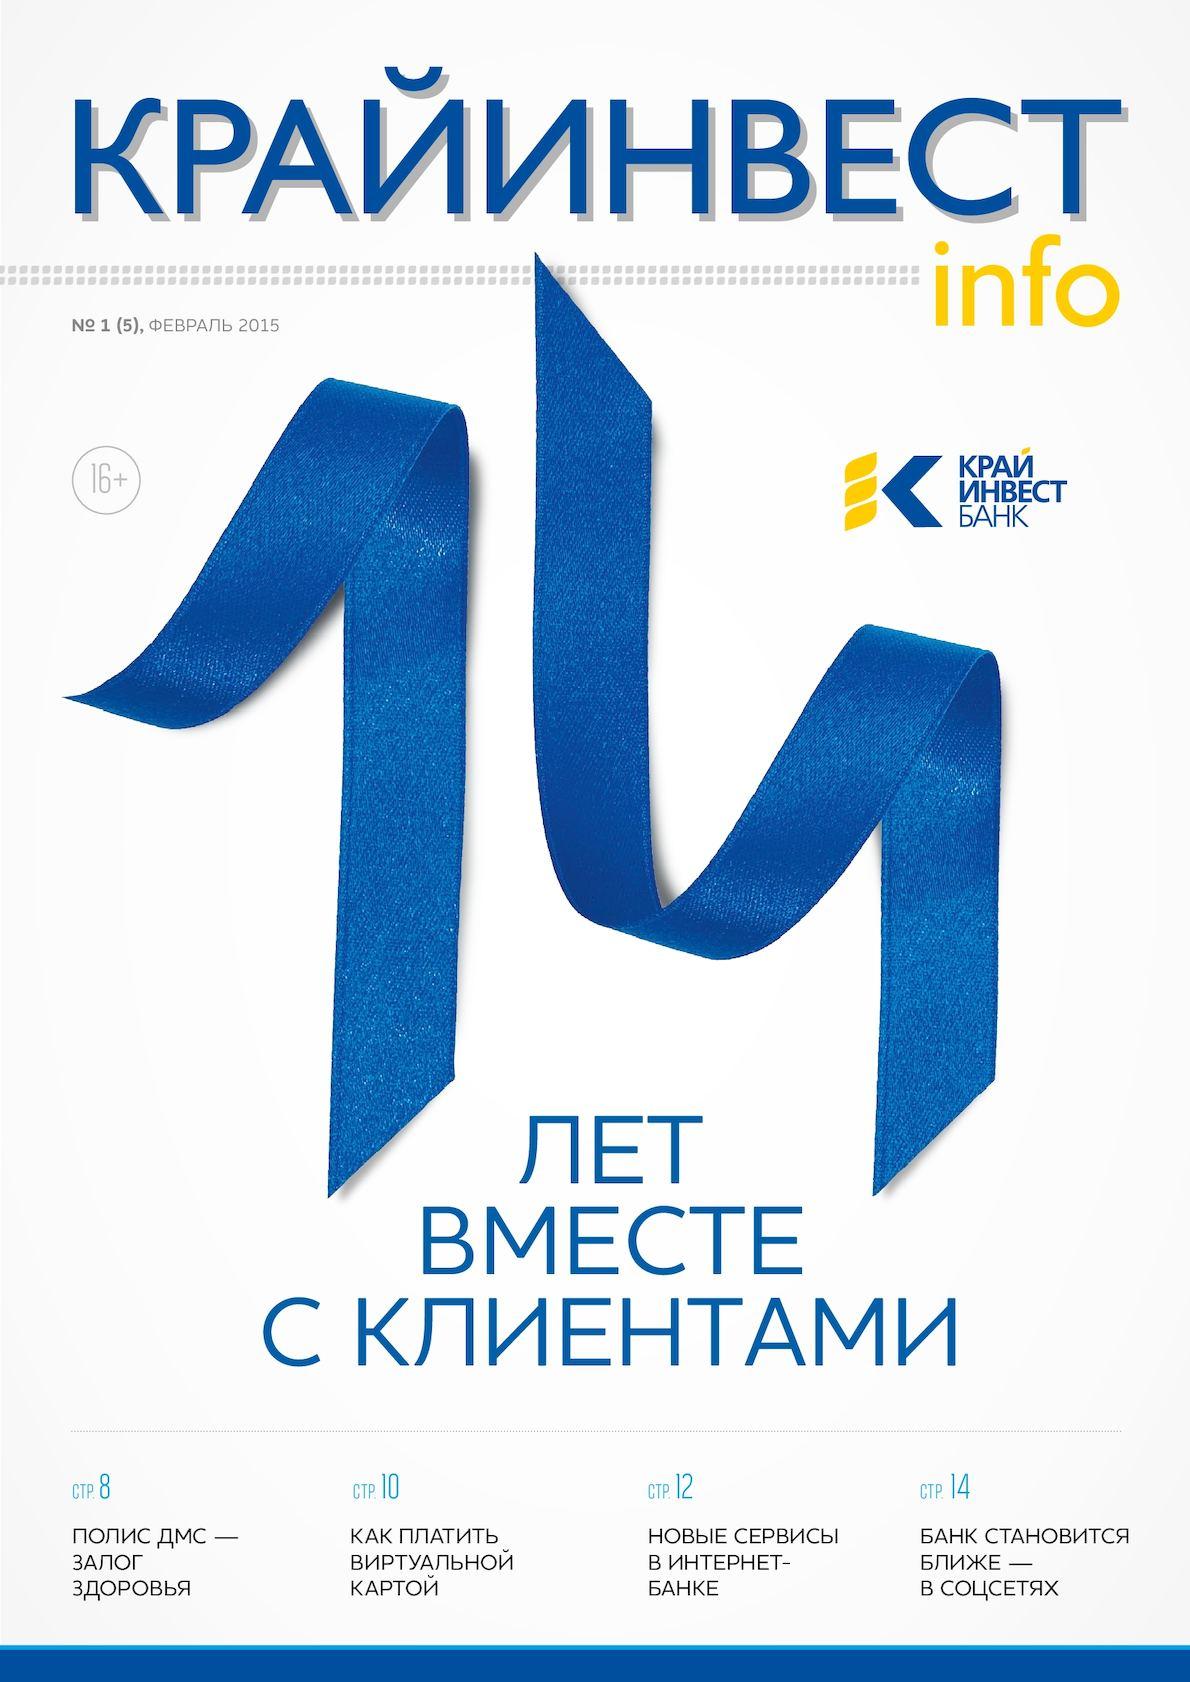 крайинвестбанк онлайн заявка на ипотеку